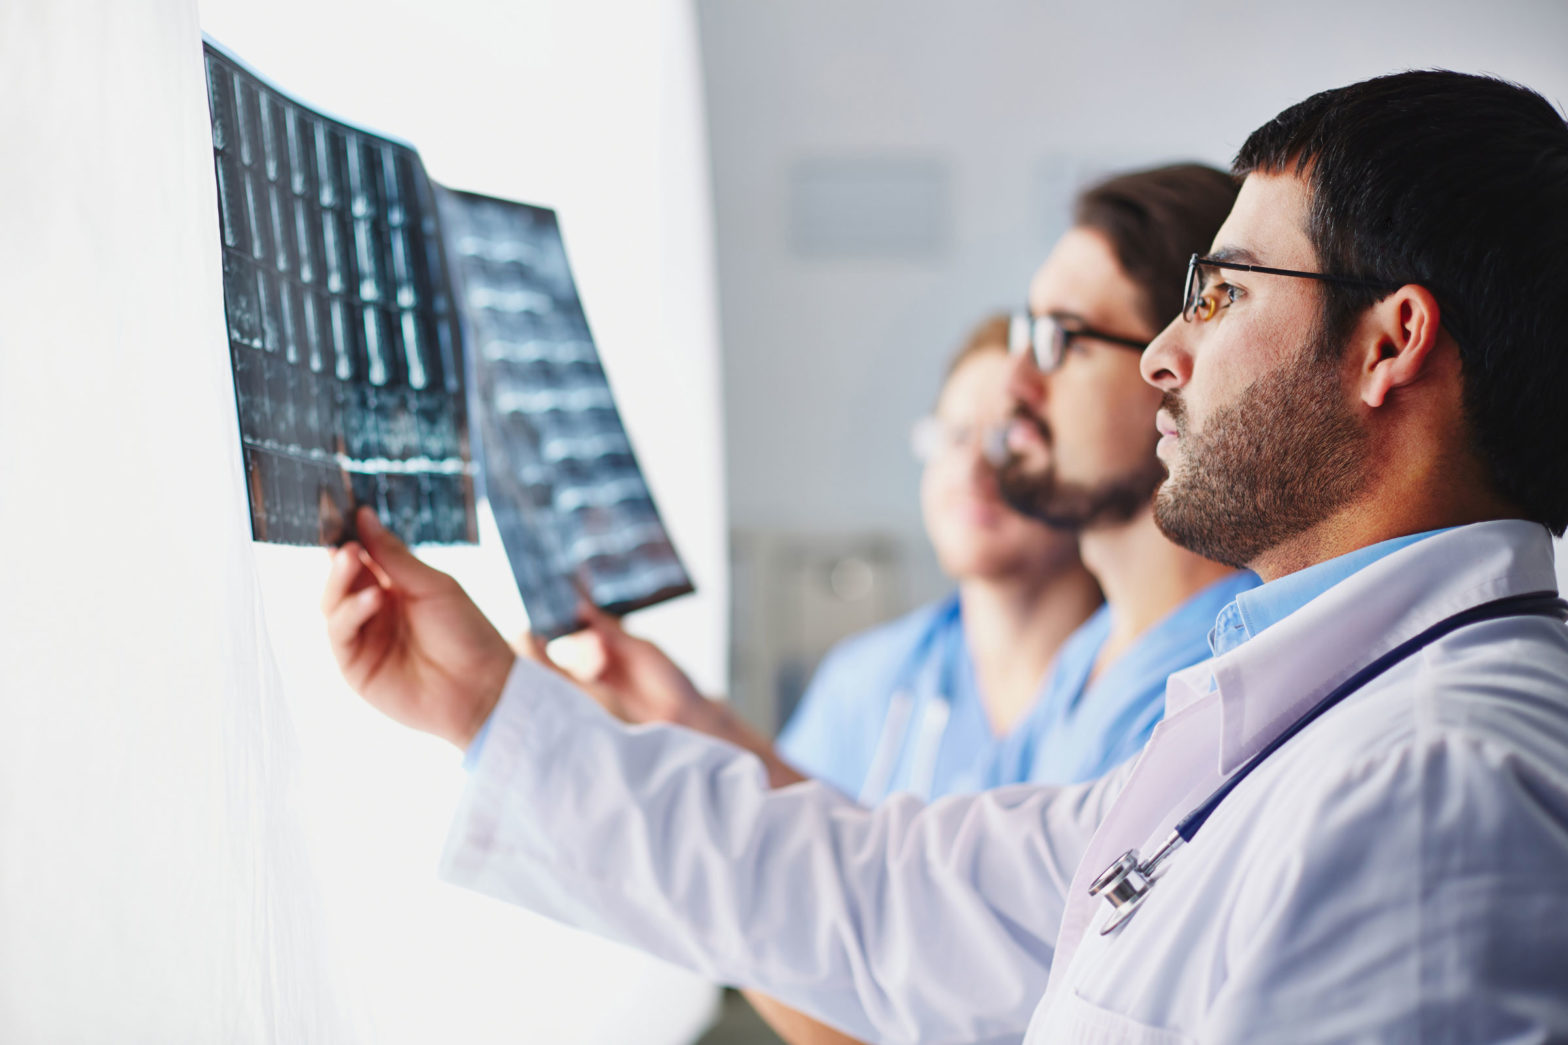 radiologista pandemia dr tis